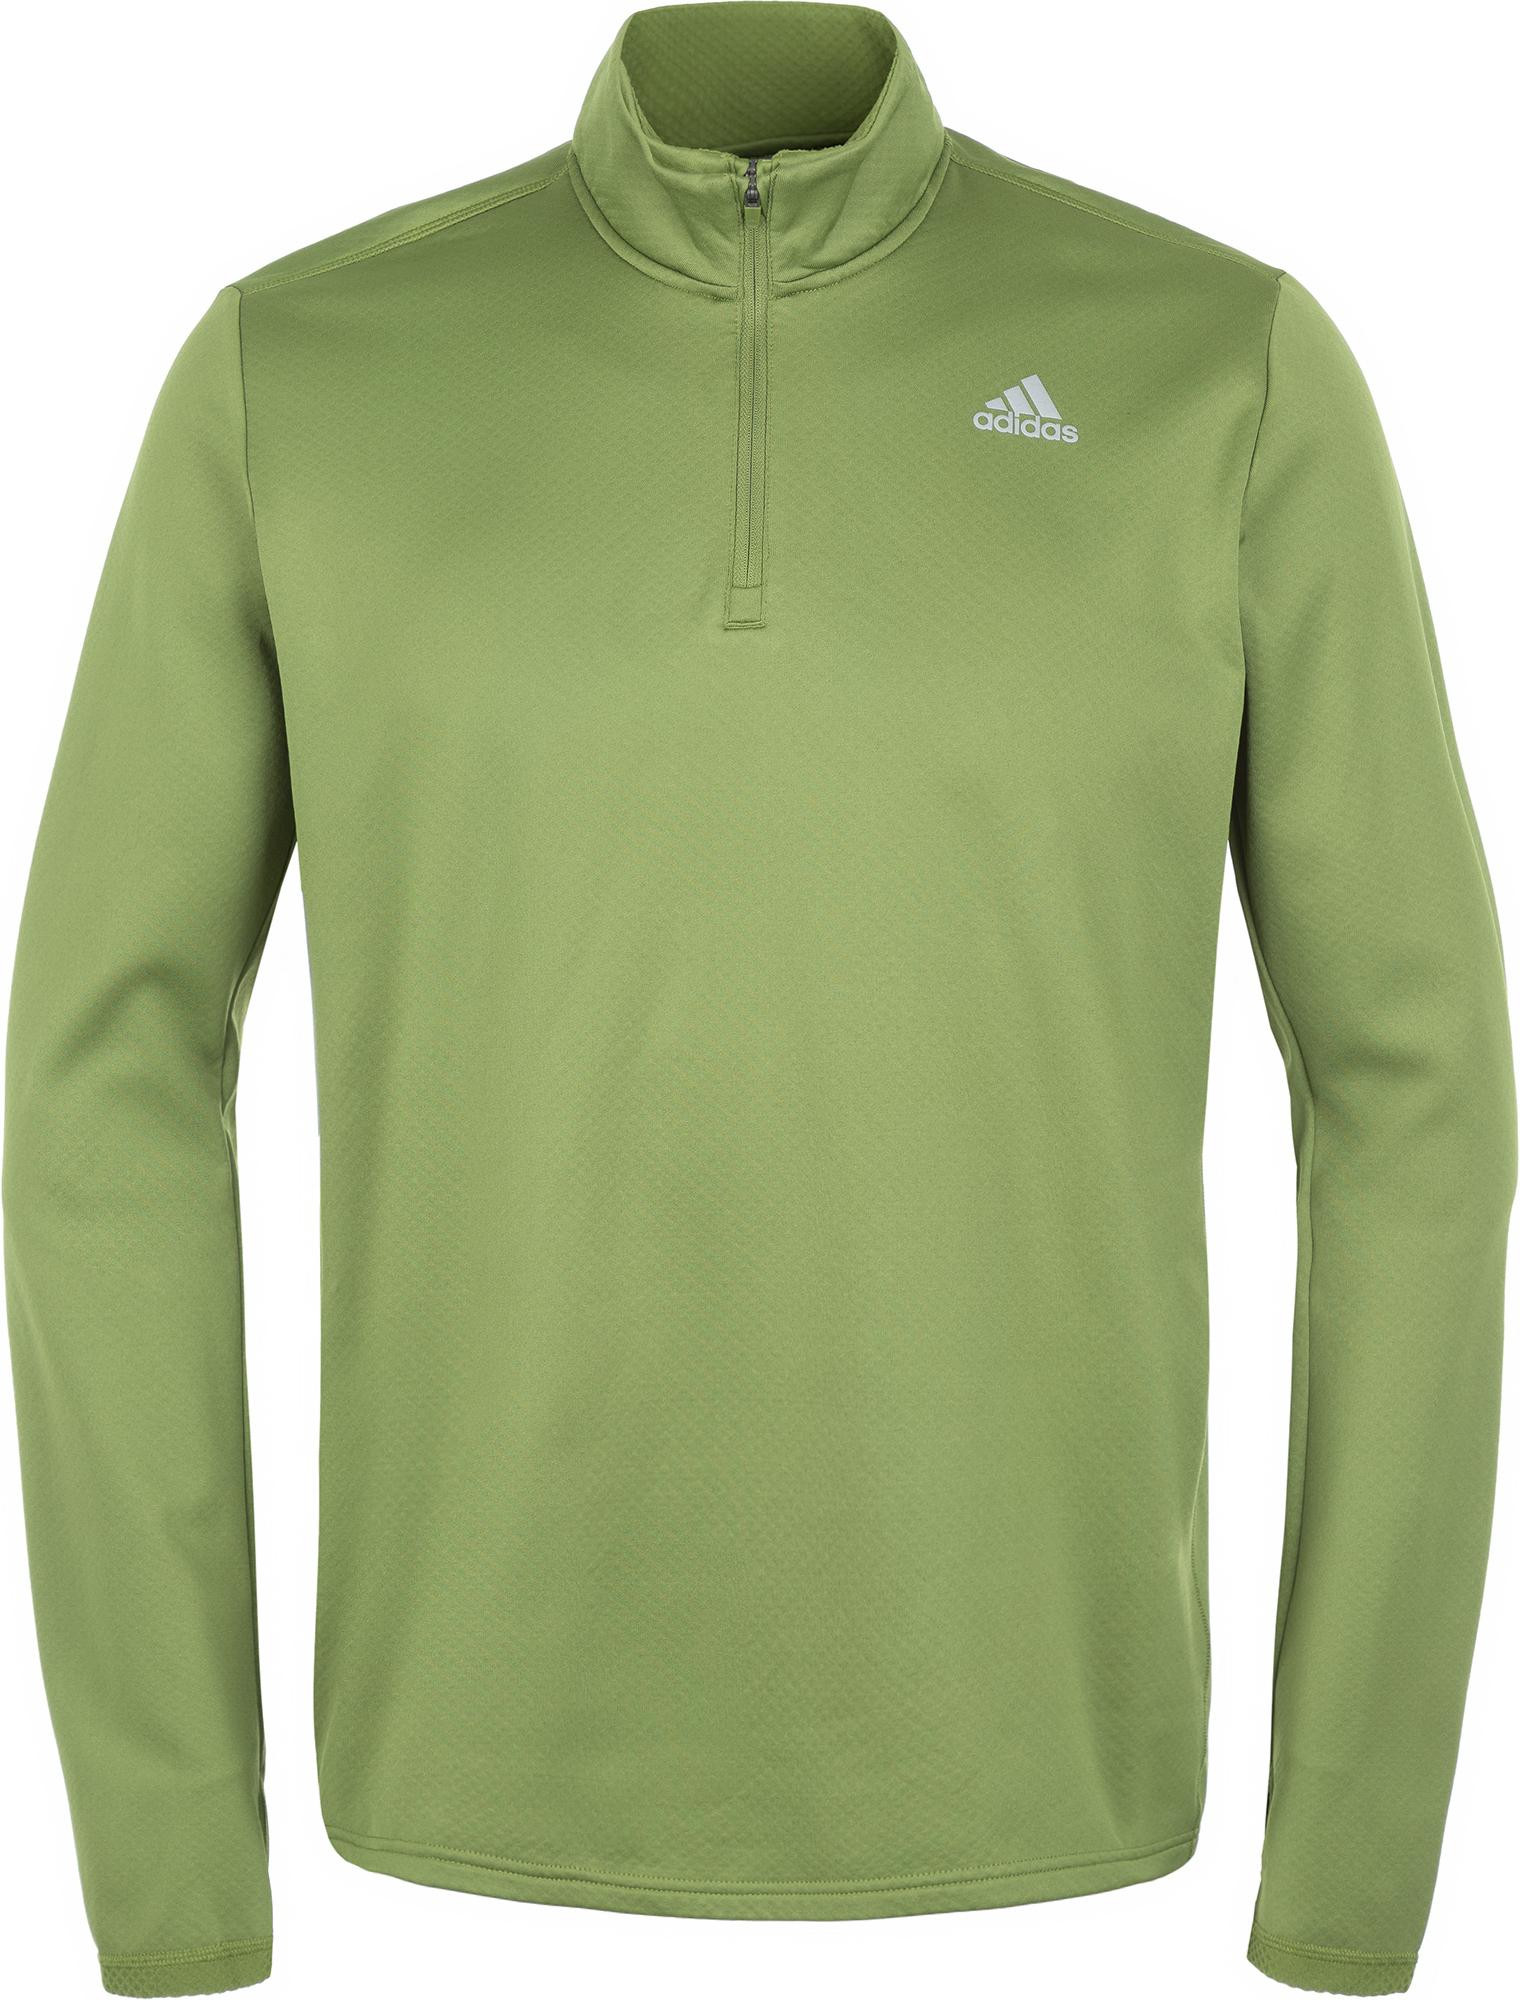 Adidas Лонгслив мужской Adidas Response Climawarm 1/4 Zip, размер 54 цена